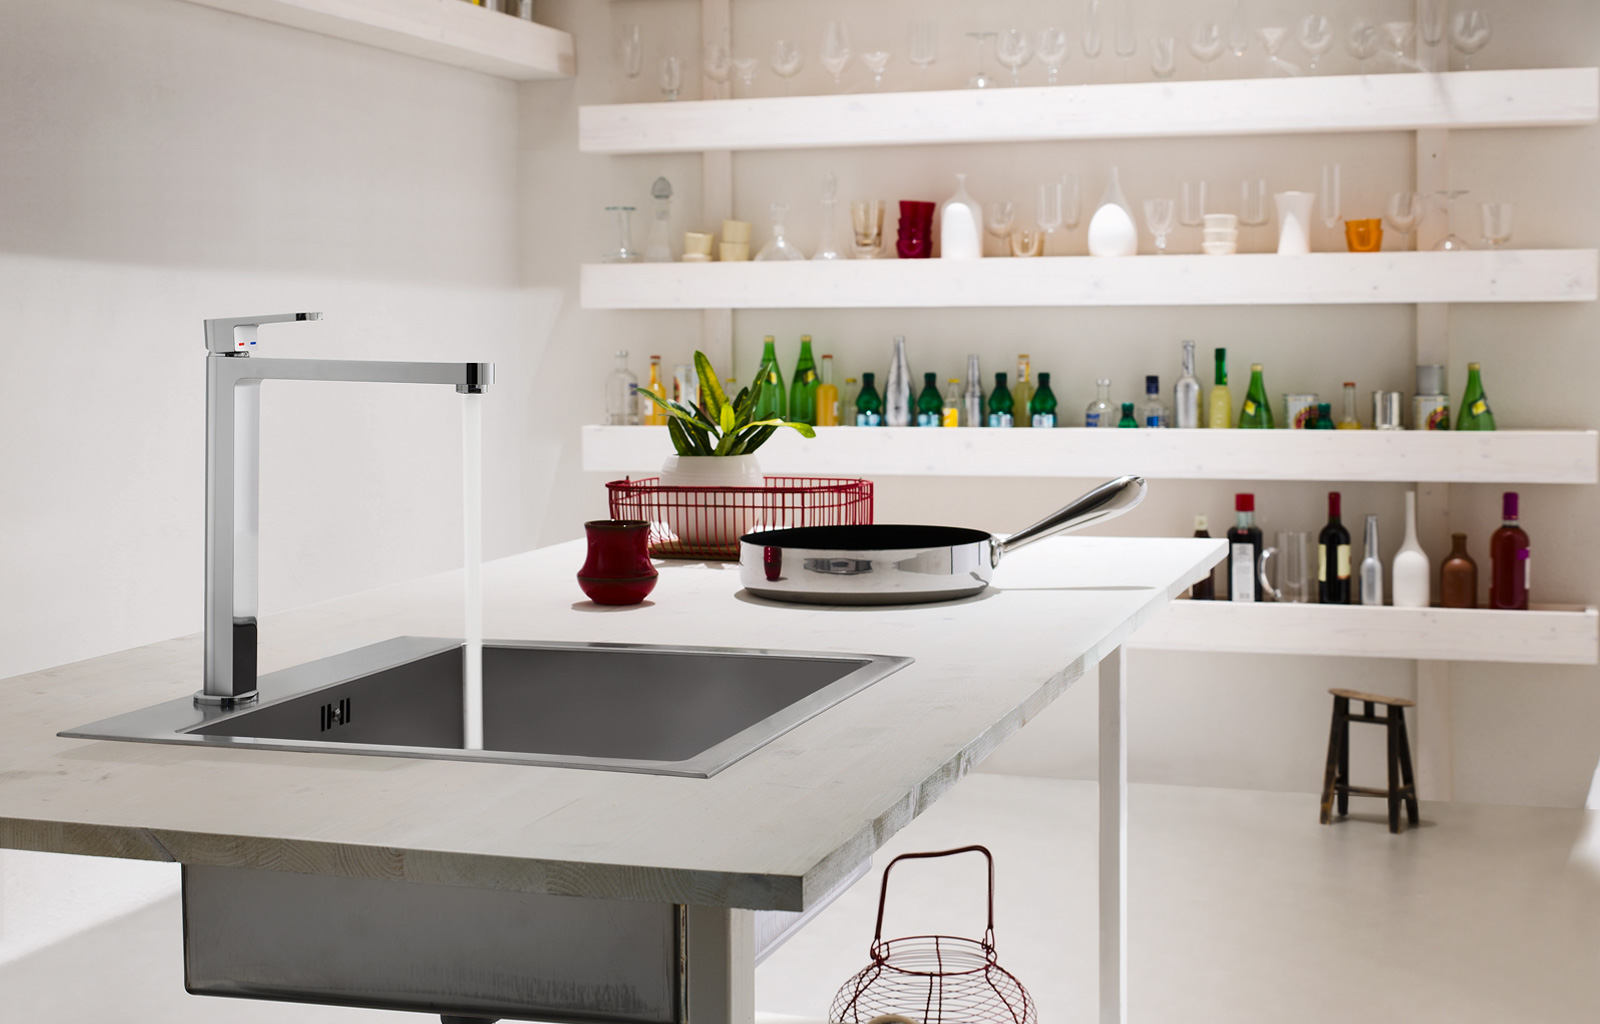 Kitchen Sinks & Mixers - Bathroom Design Malta